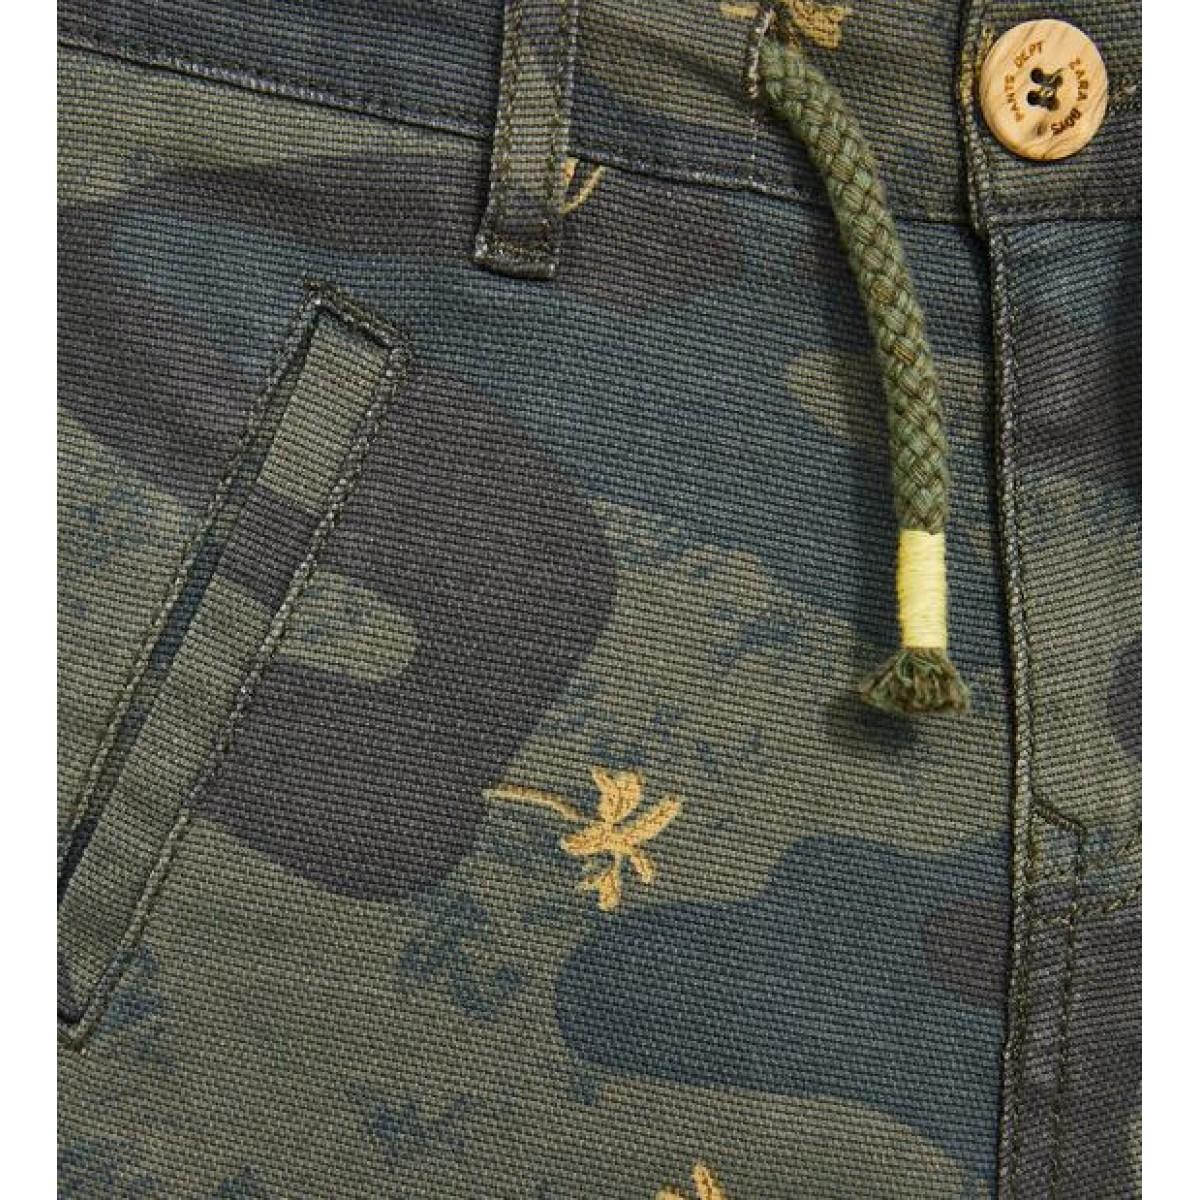 Zara Camouflage Bermuda Shorts